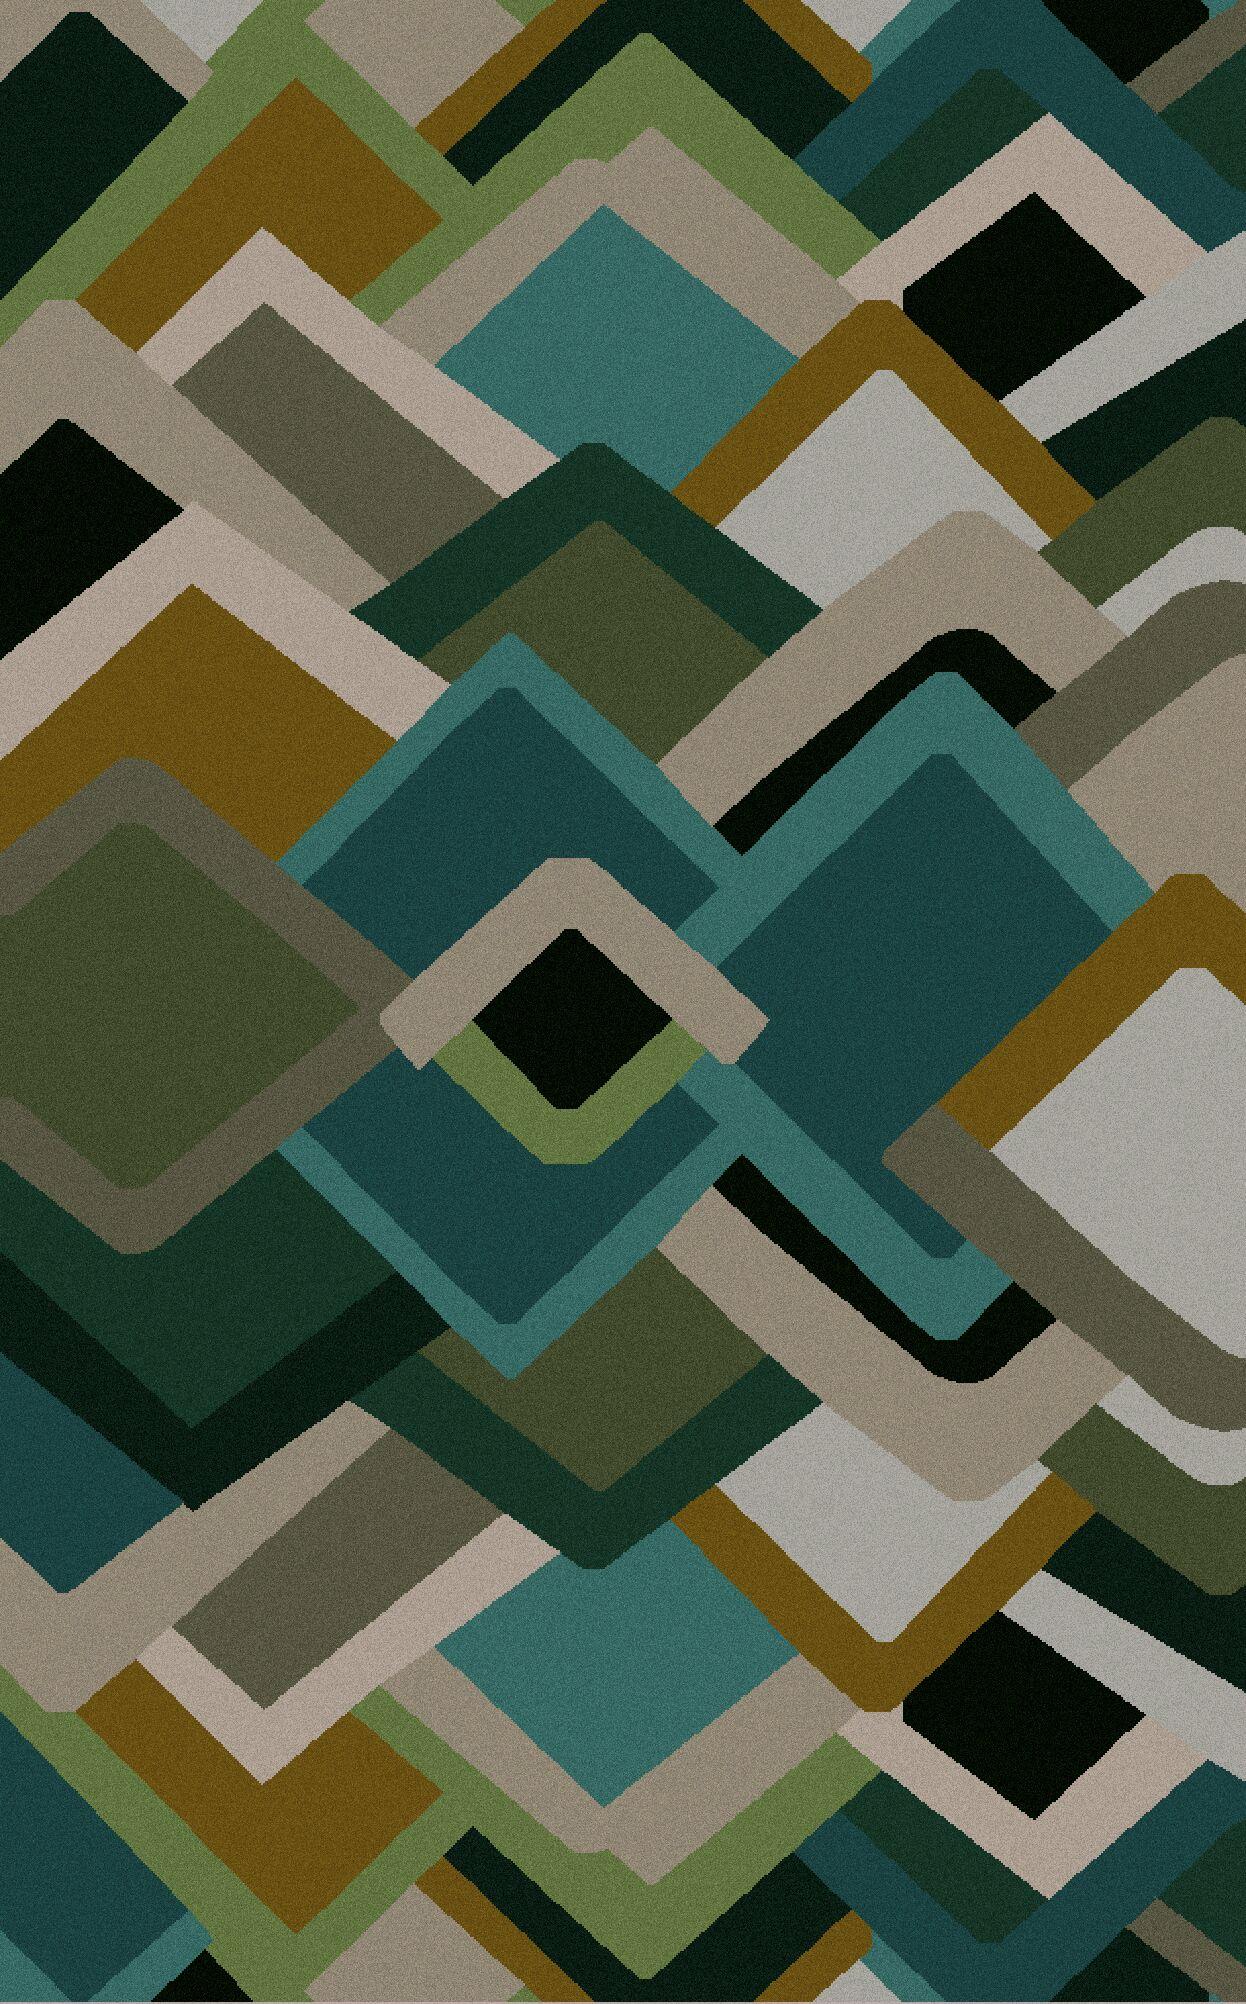 Driskill Geometric Hand-Tufted Area Rug Rug Size: Rectangle 3'3